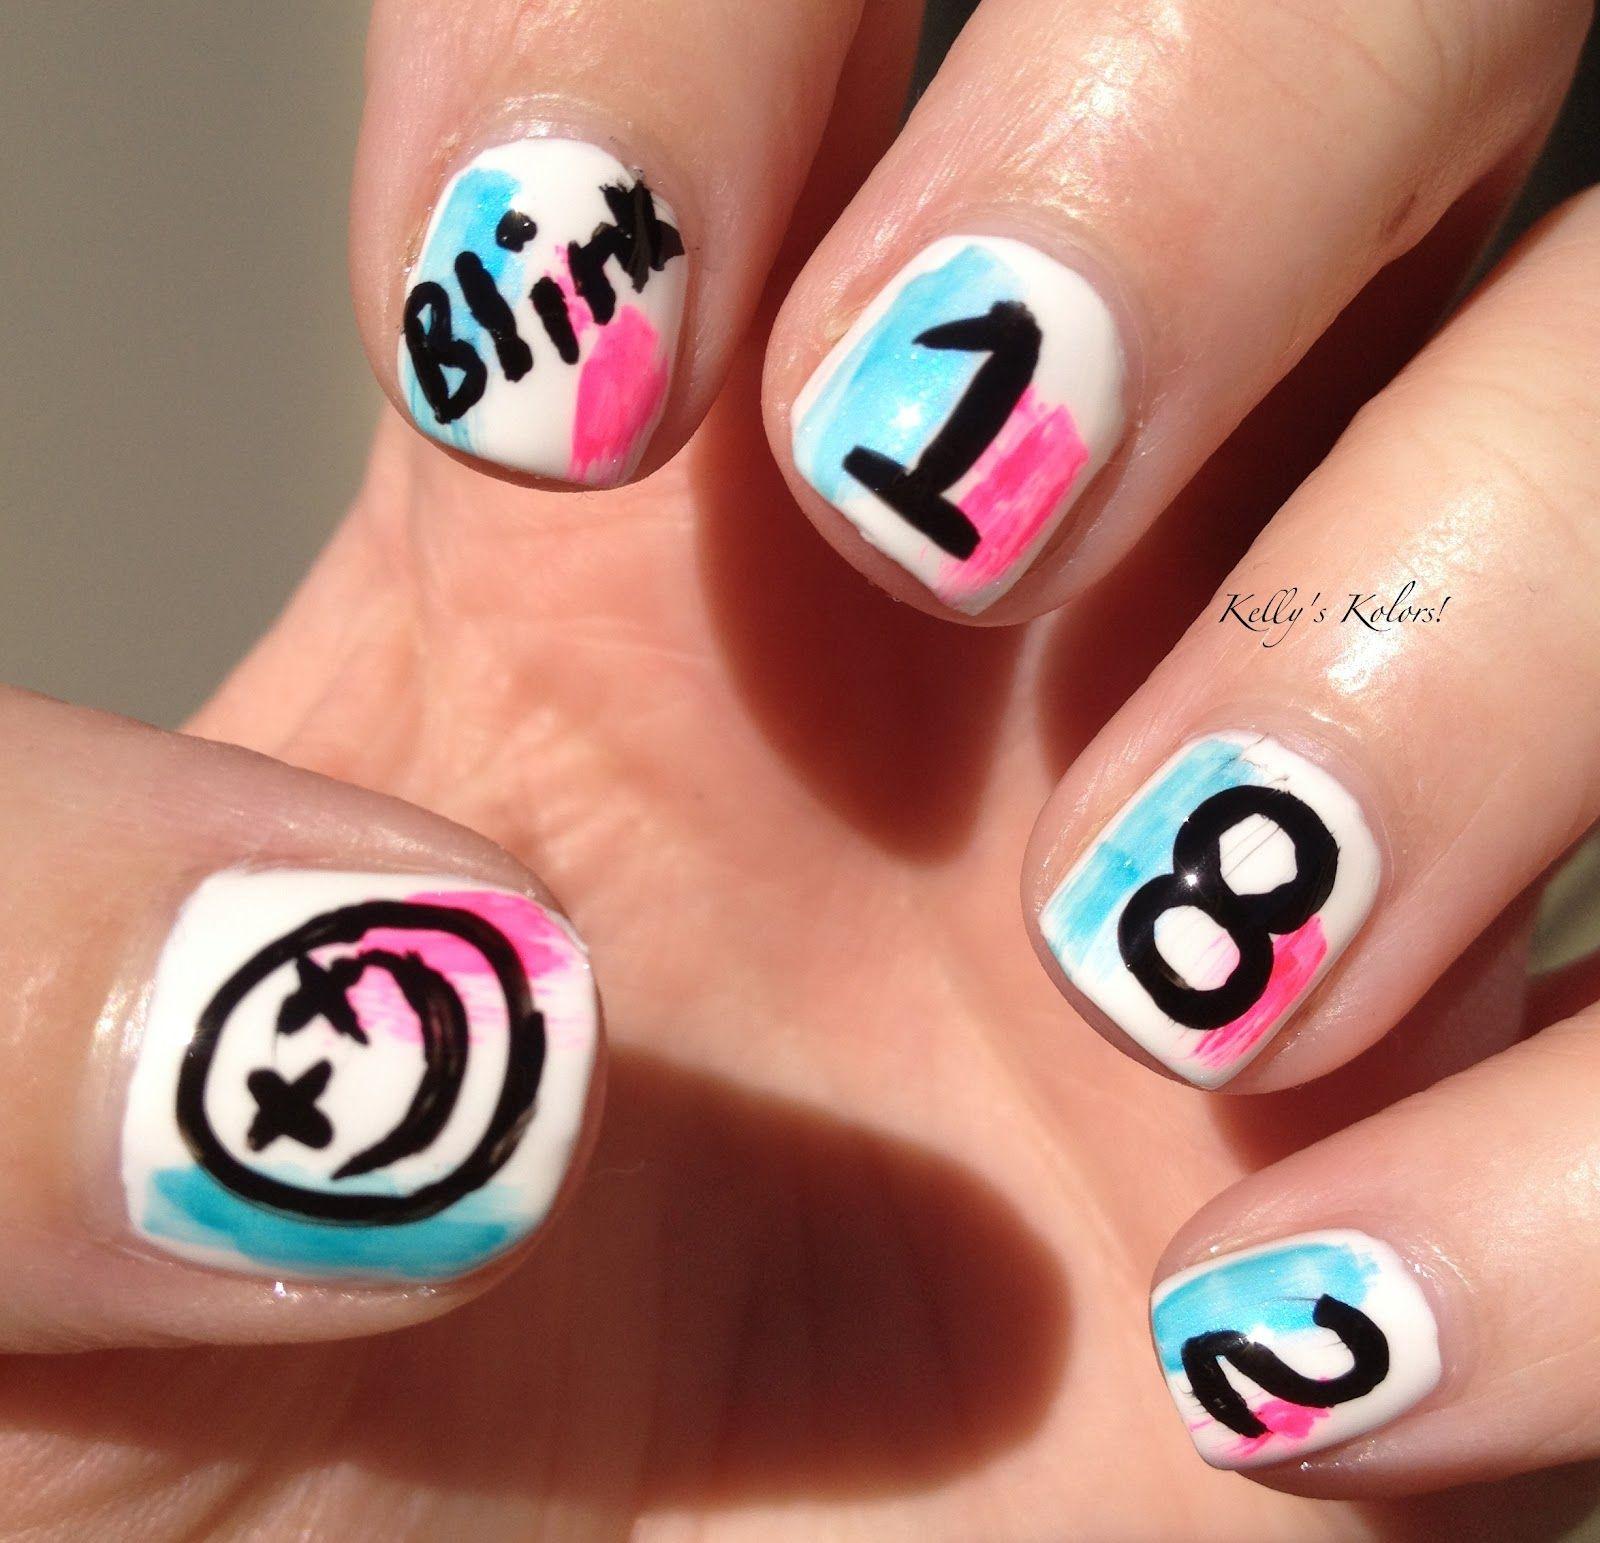 Blink-182 Nail Art, true fan would do this | Hair & Beauty ...